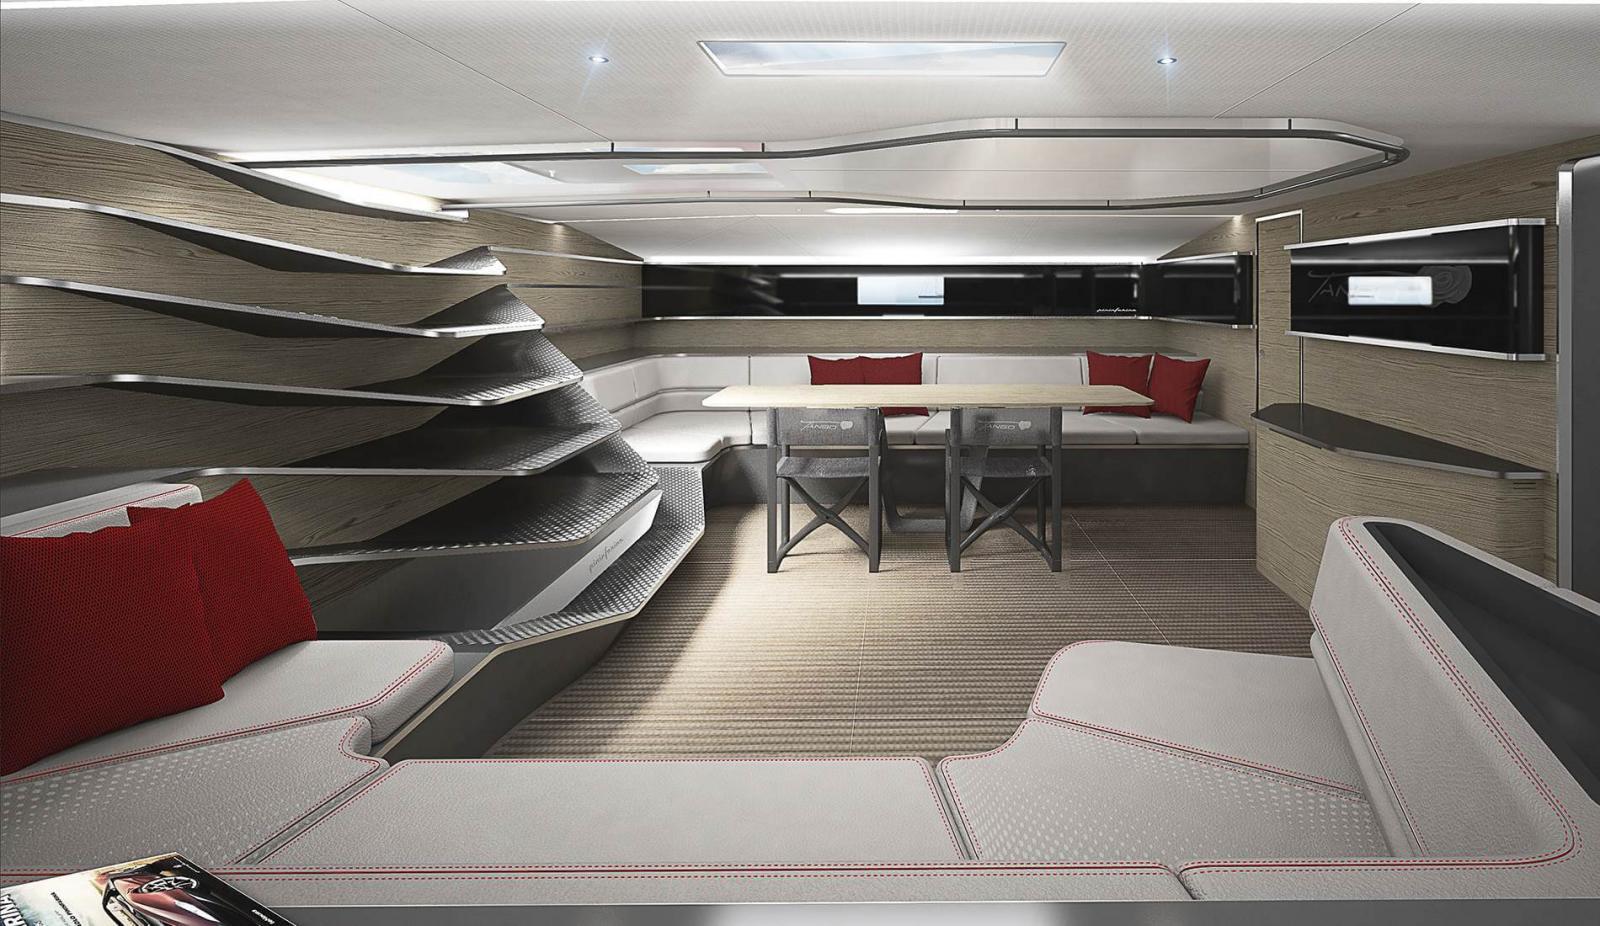 Wallycento Hull 4 Tango - Sailing Yacht - Dinning Room